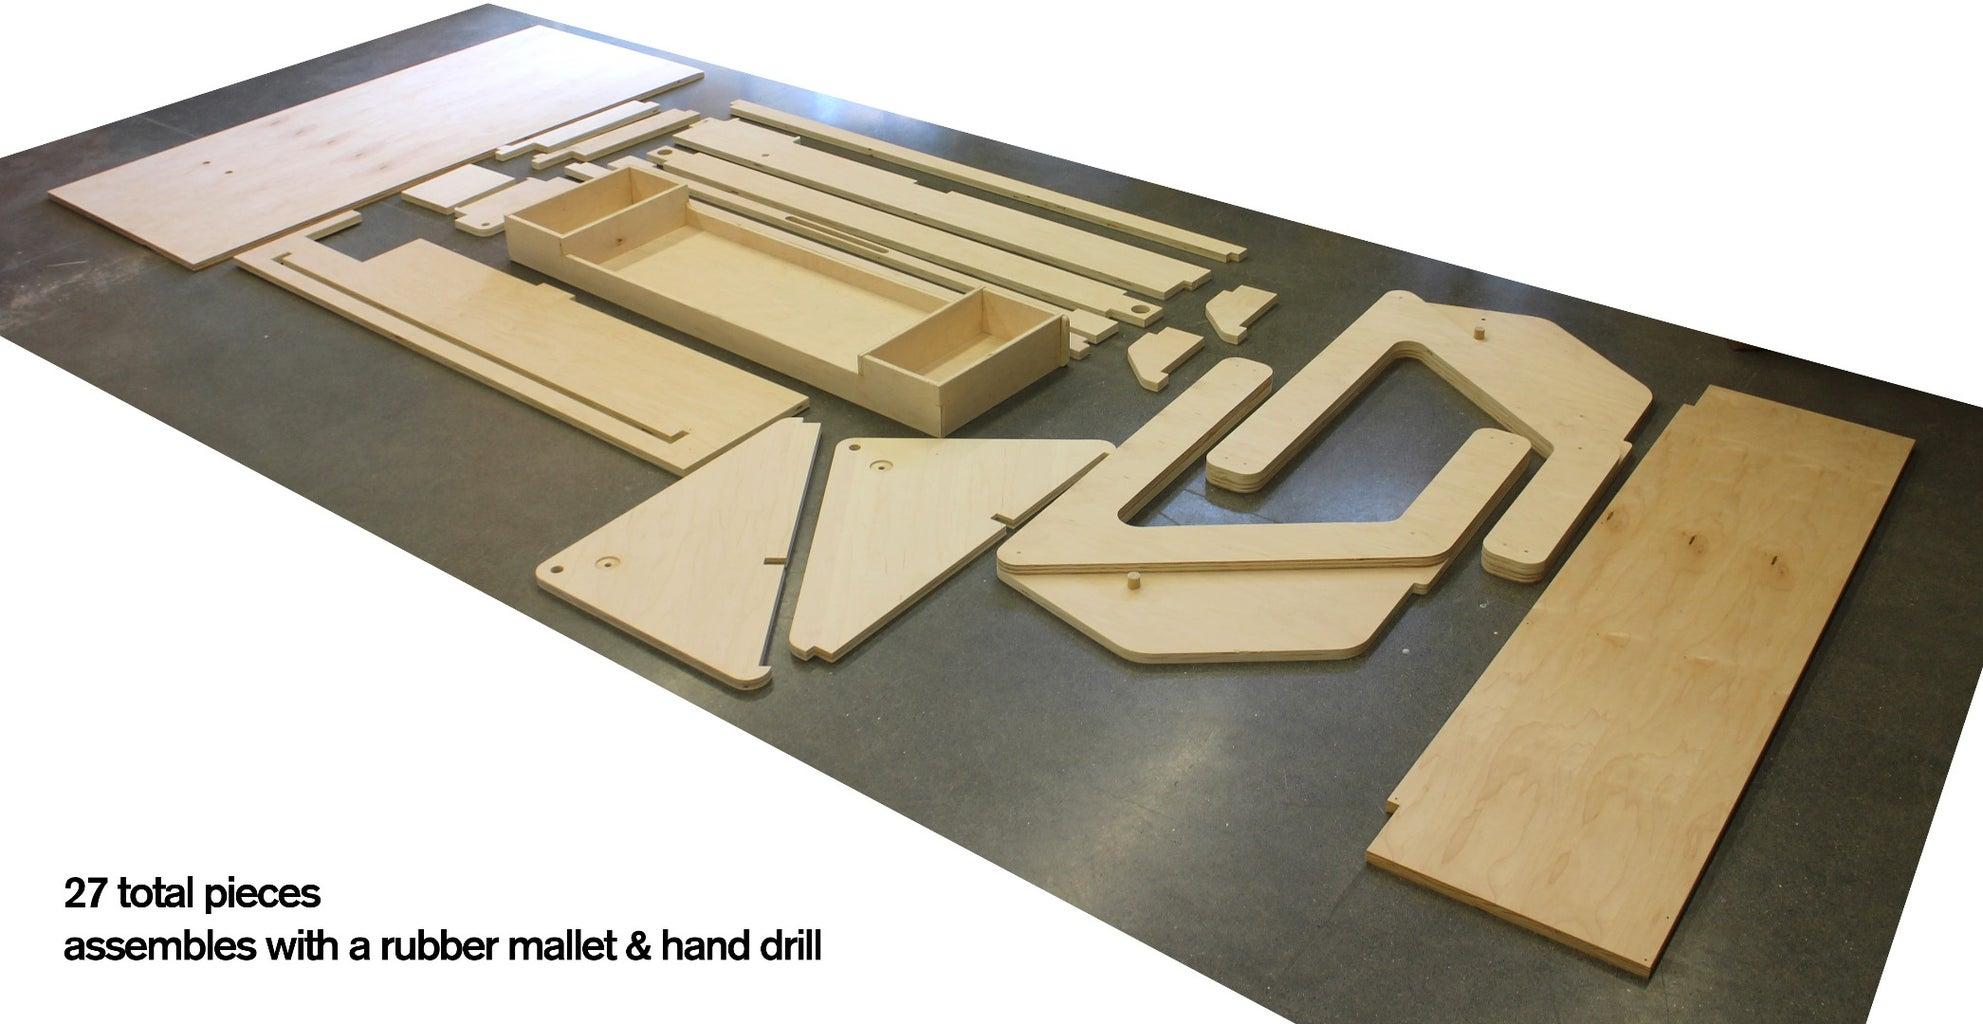 Assembly Method